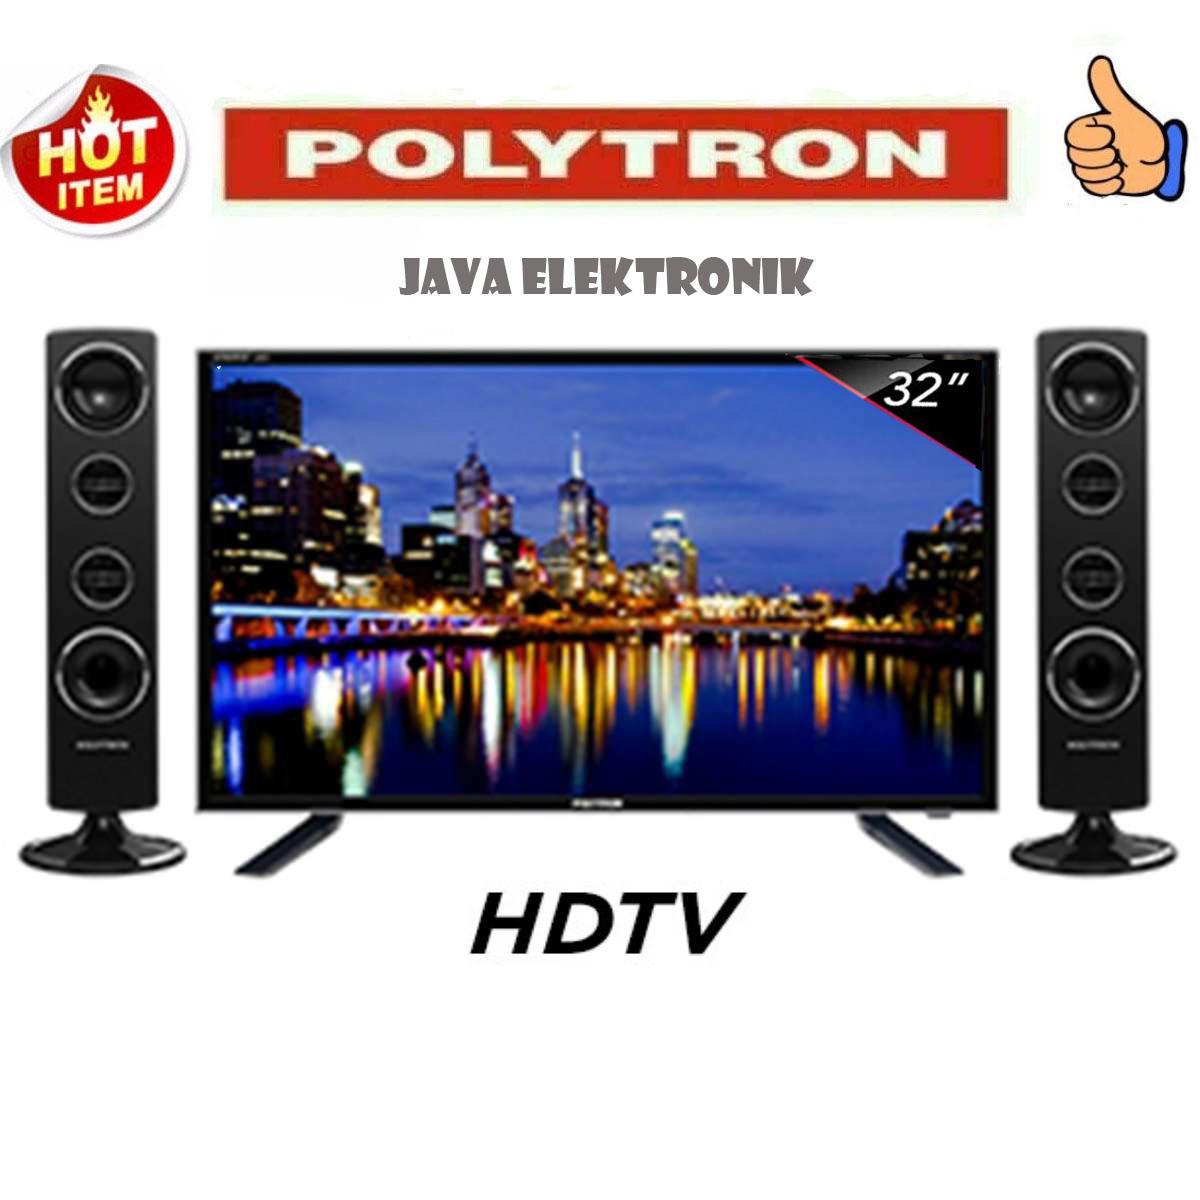 POLYTRON LED TV 32 Inch HD - PLD32T1850 [Speaker Tower]